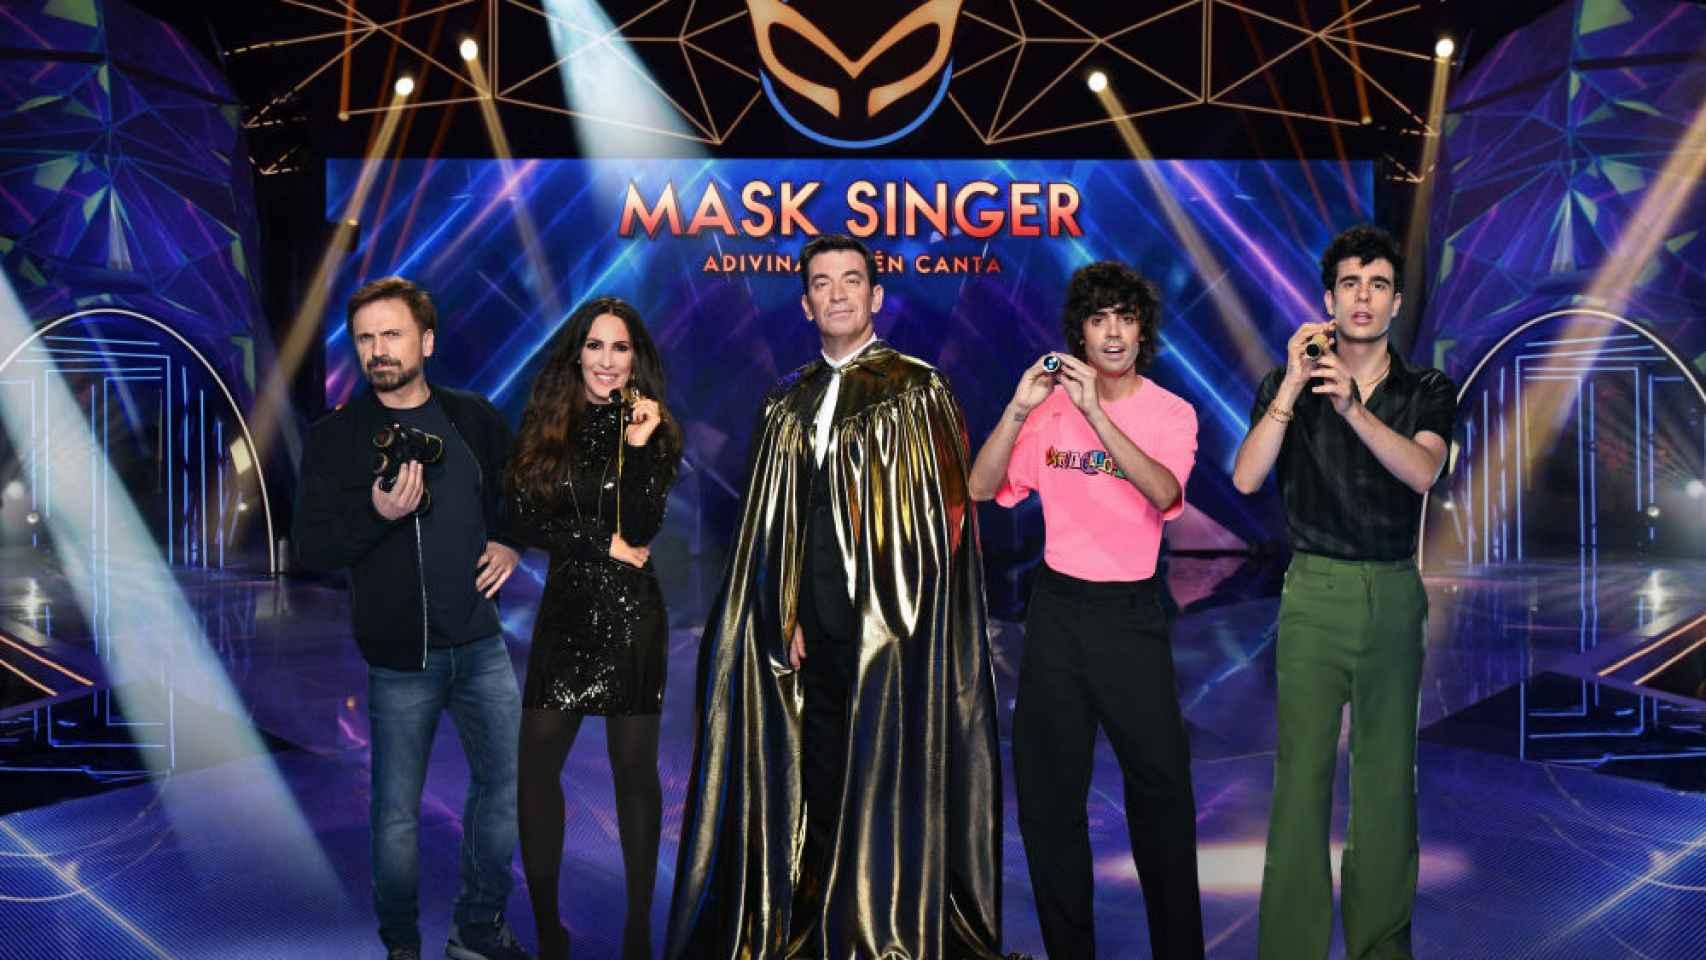 'Mask singer' arranca este miércoles 4 de noviembre en Antena 3.